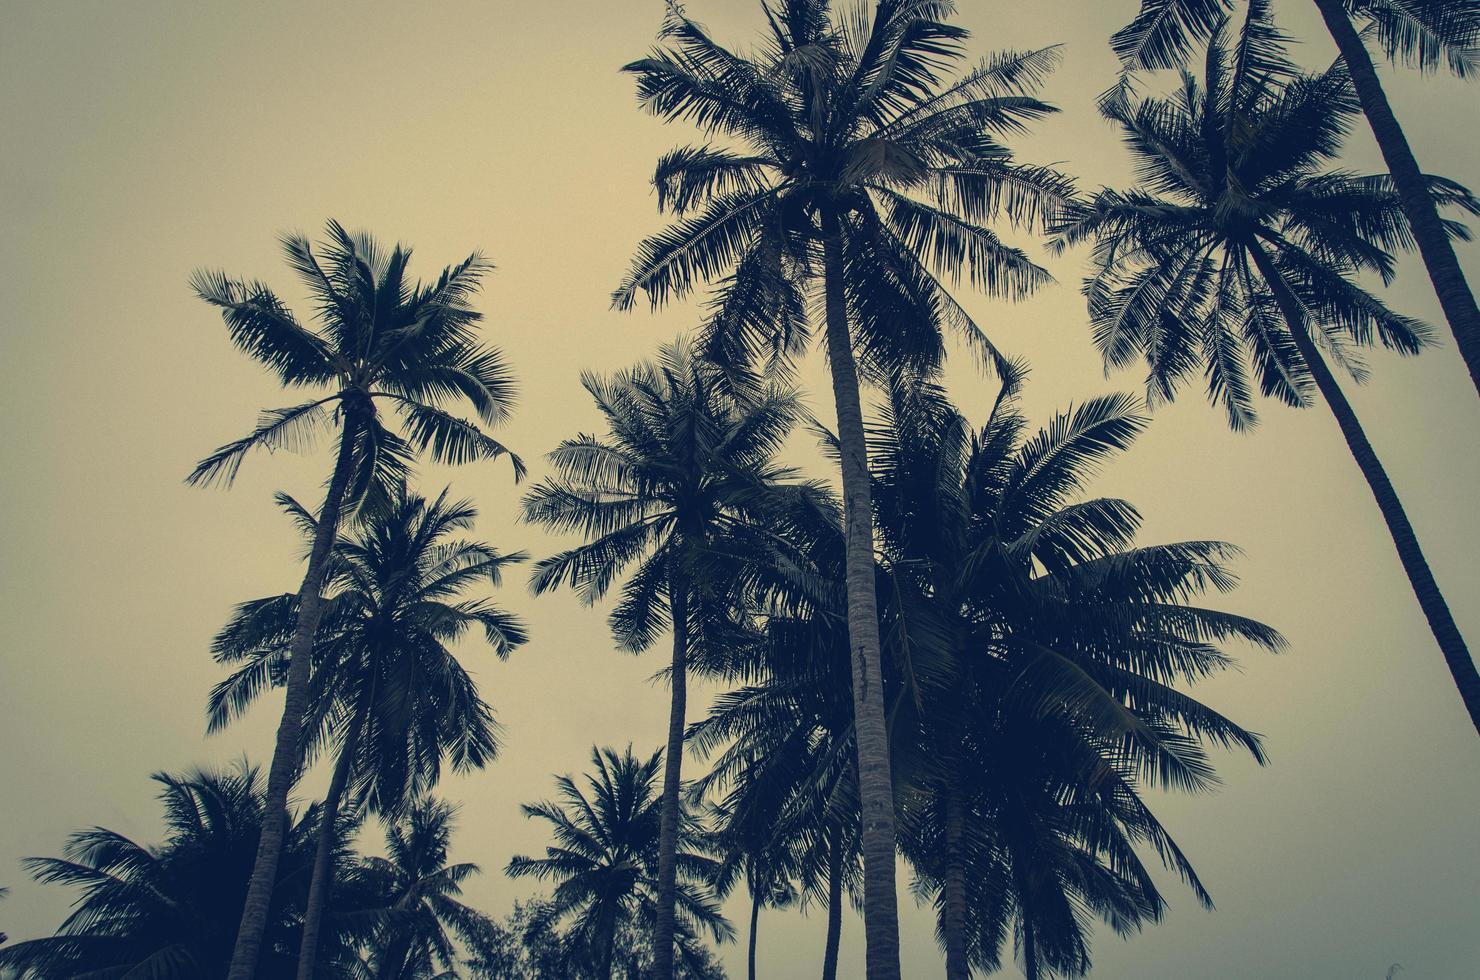 palmbomen onder grijze luchten foto